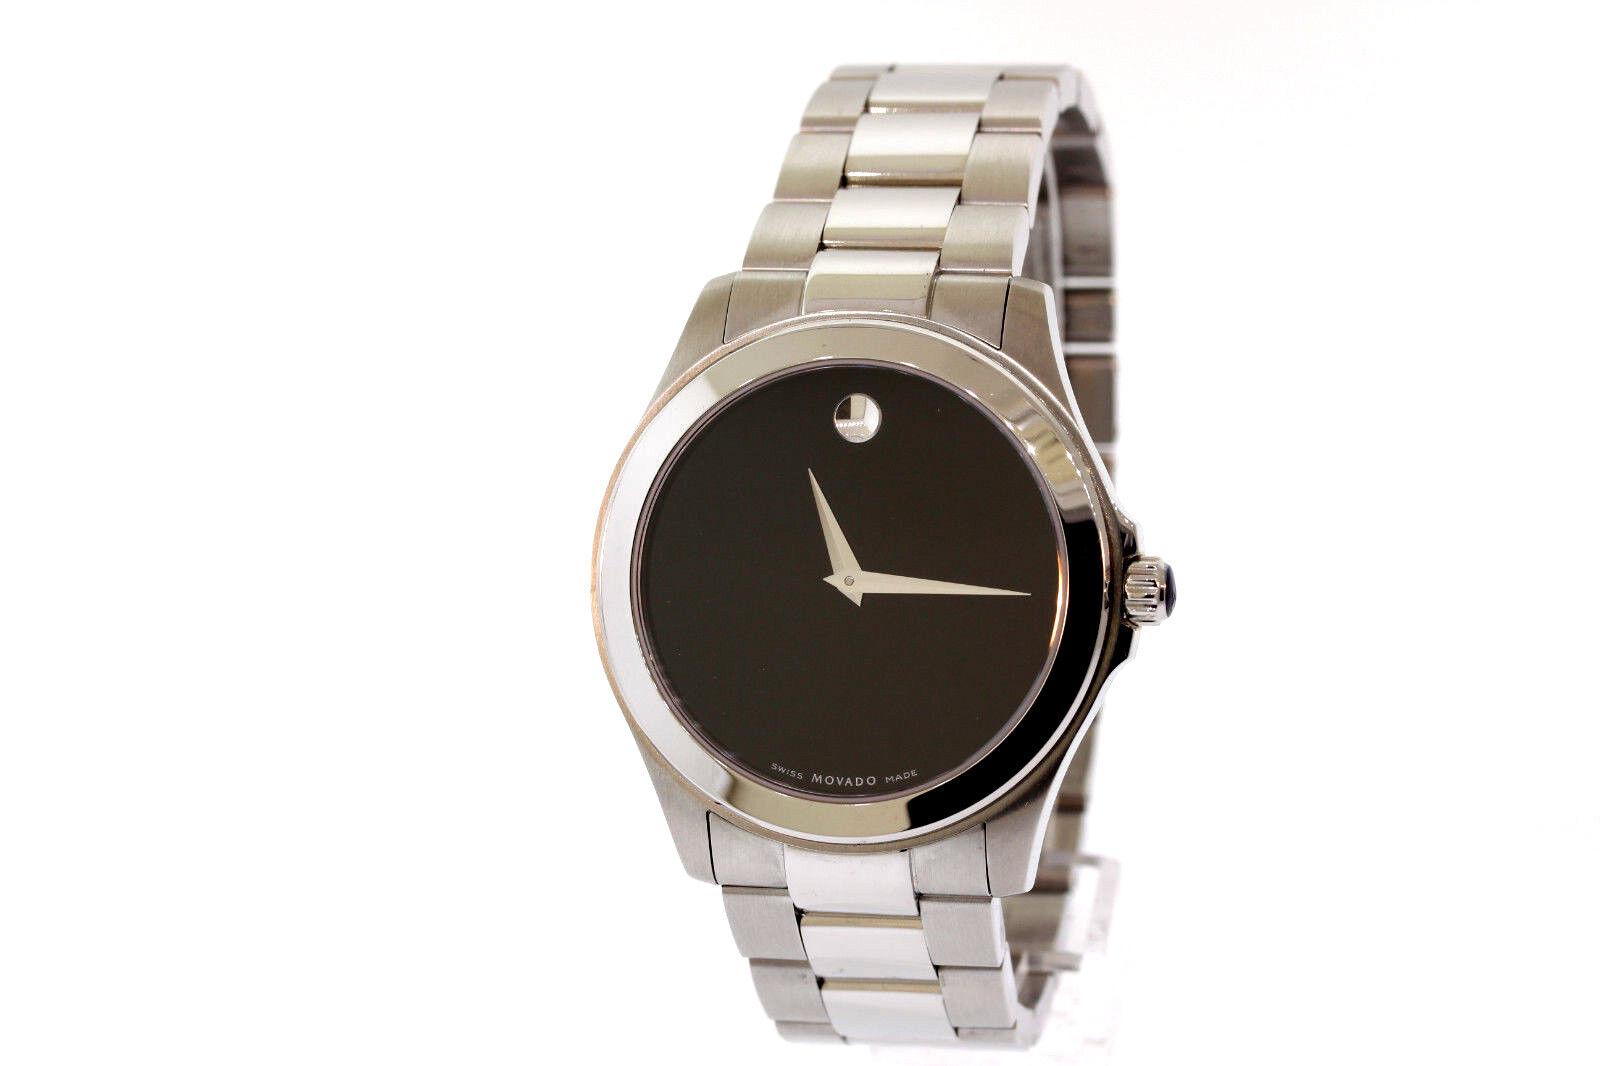 Men's Movado 0605746 JUNIOR SPORT Stainless Steel Black Dial Quartz Watch